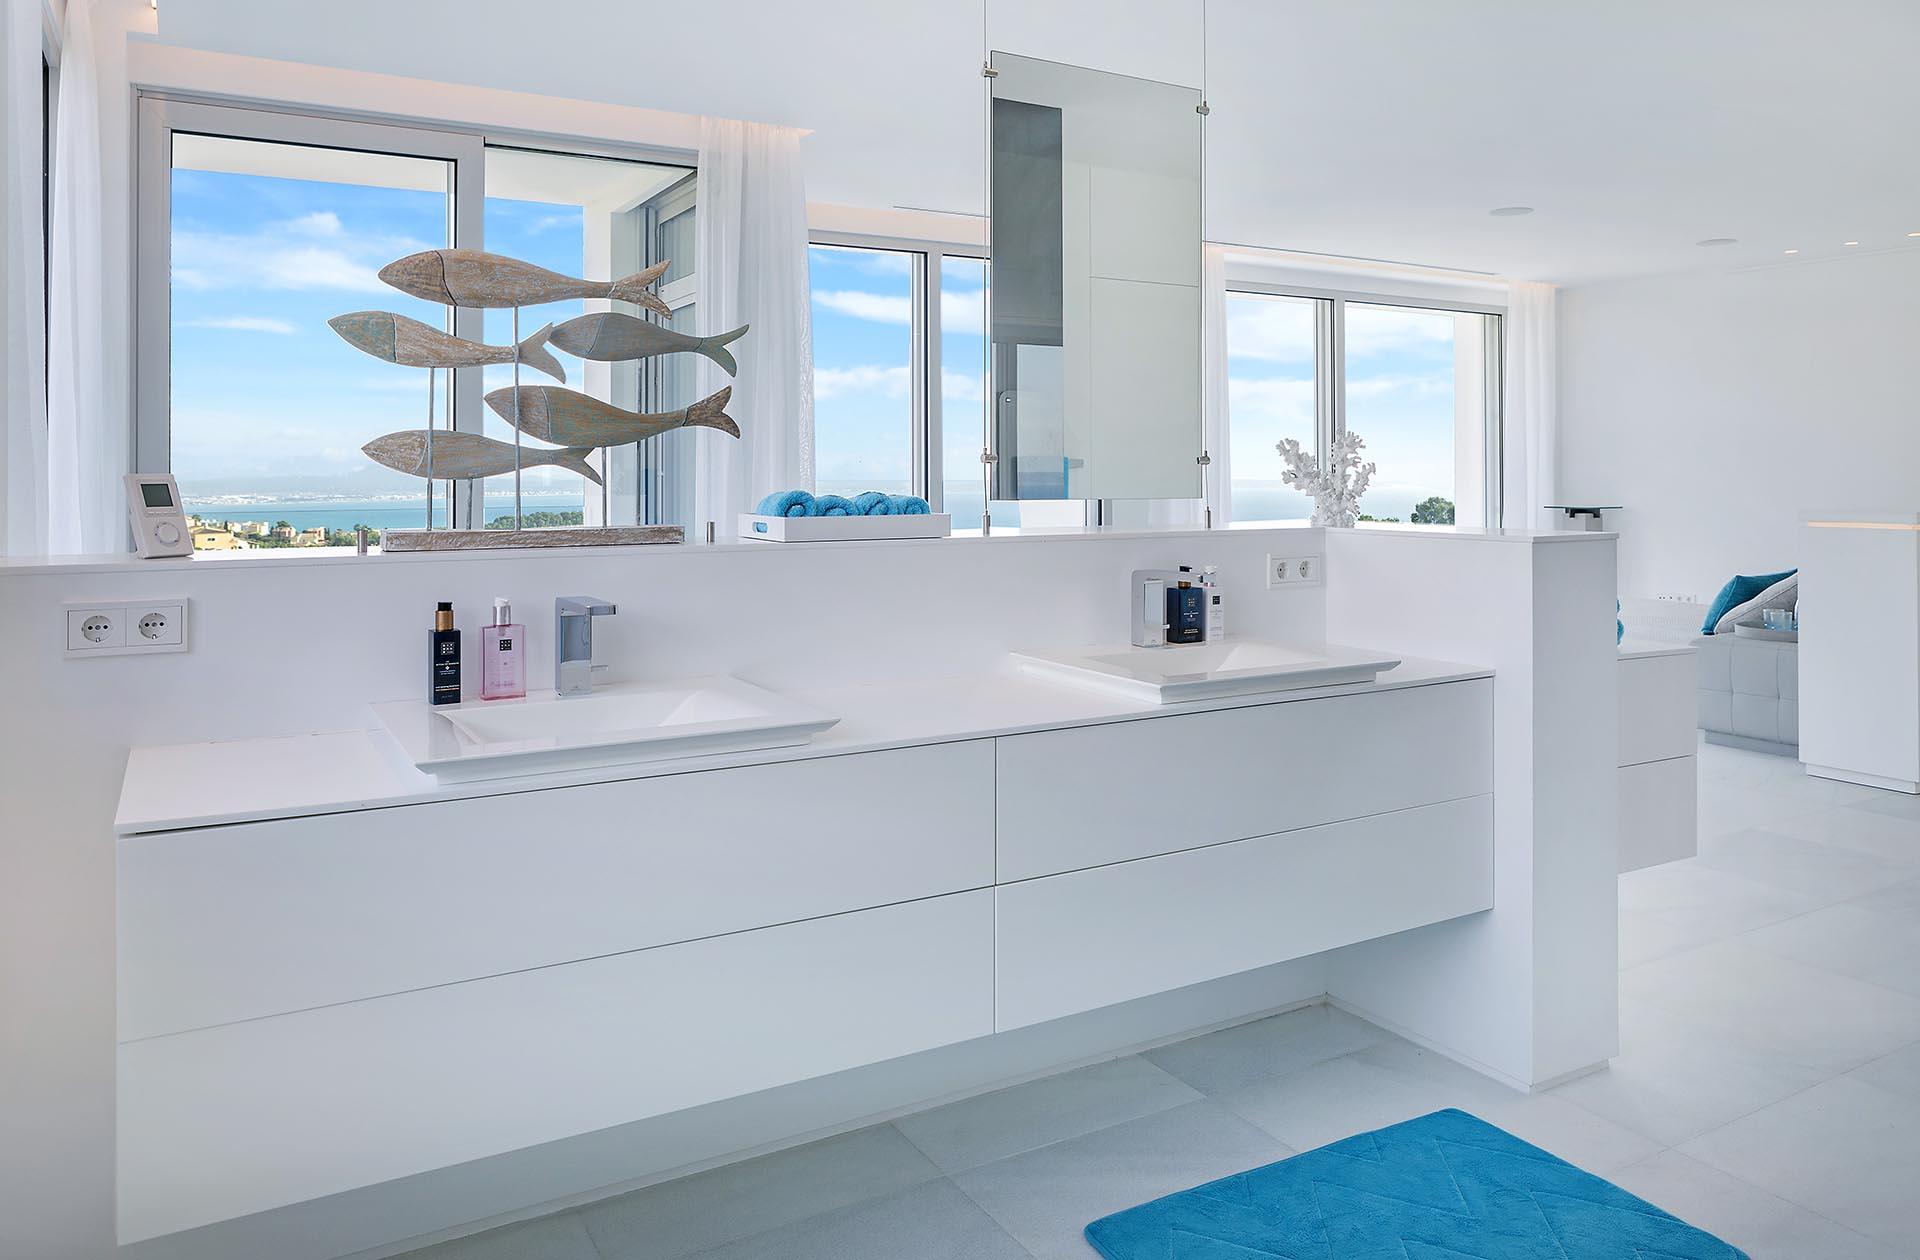 Beautiful modern villa in Costa den Blanes - Modern bathroom